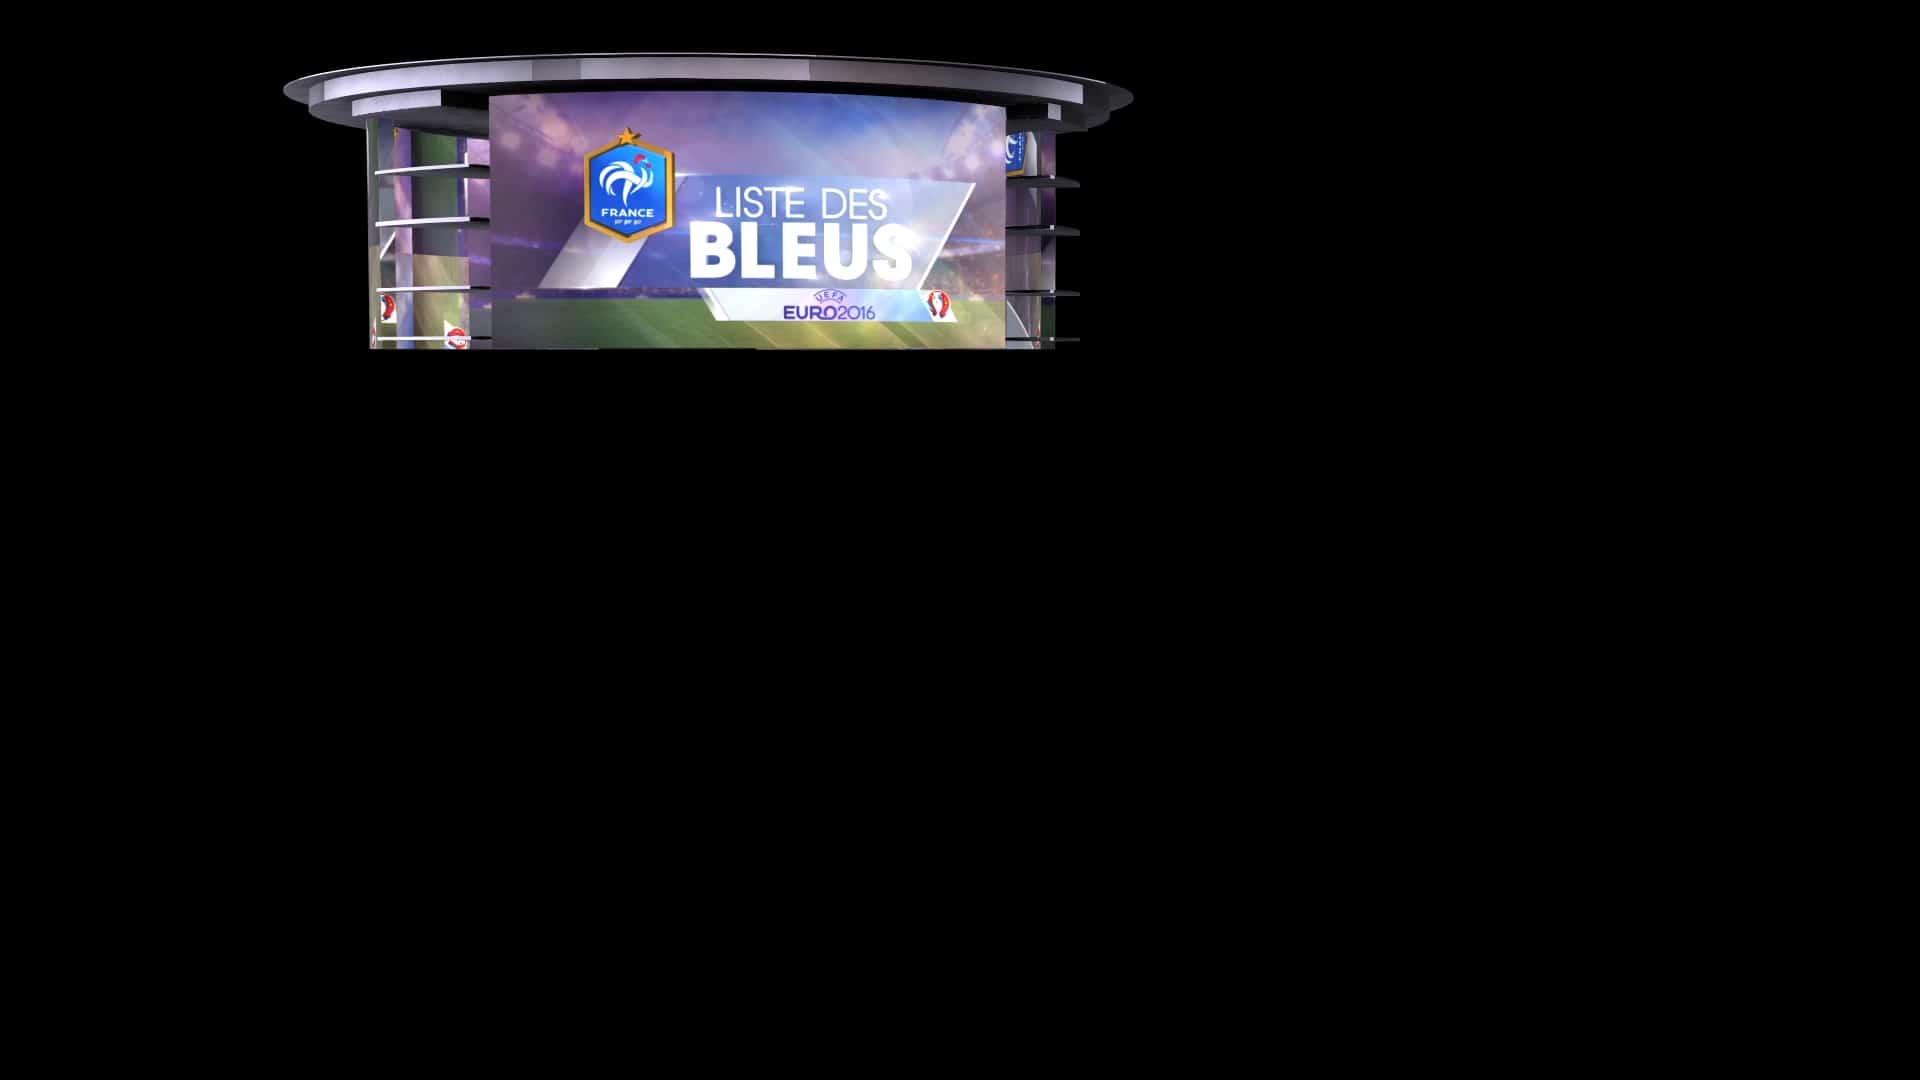 TRANSITION VELUM_EURO 2016_TF1_OLIVIER GERARD